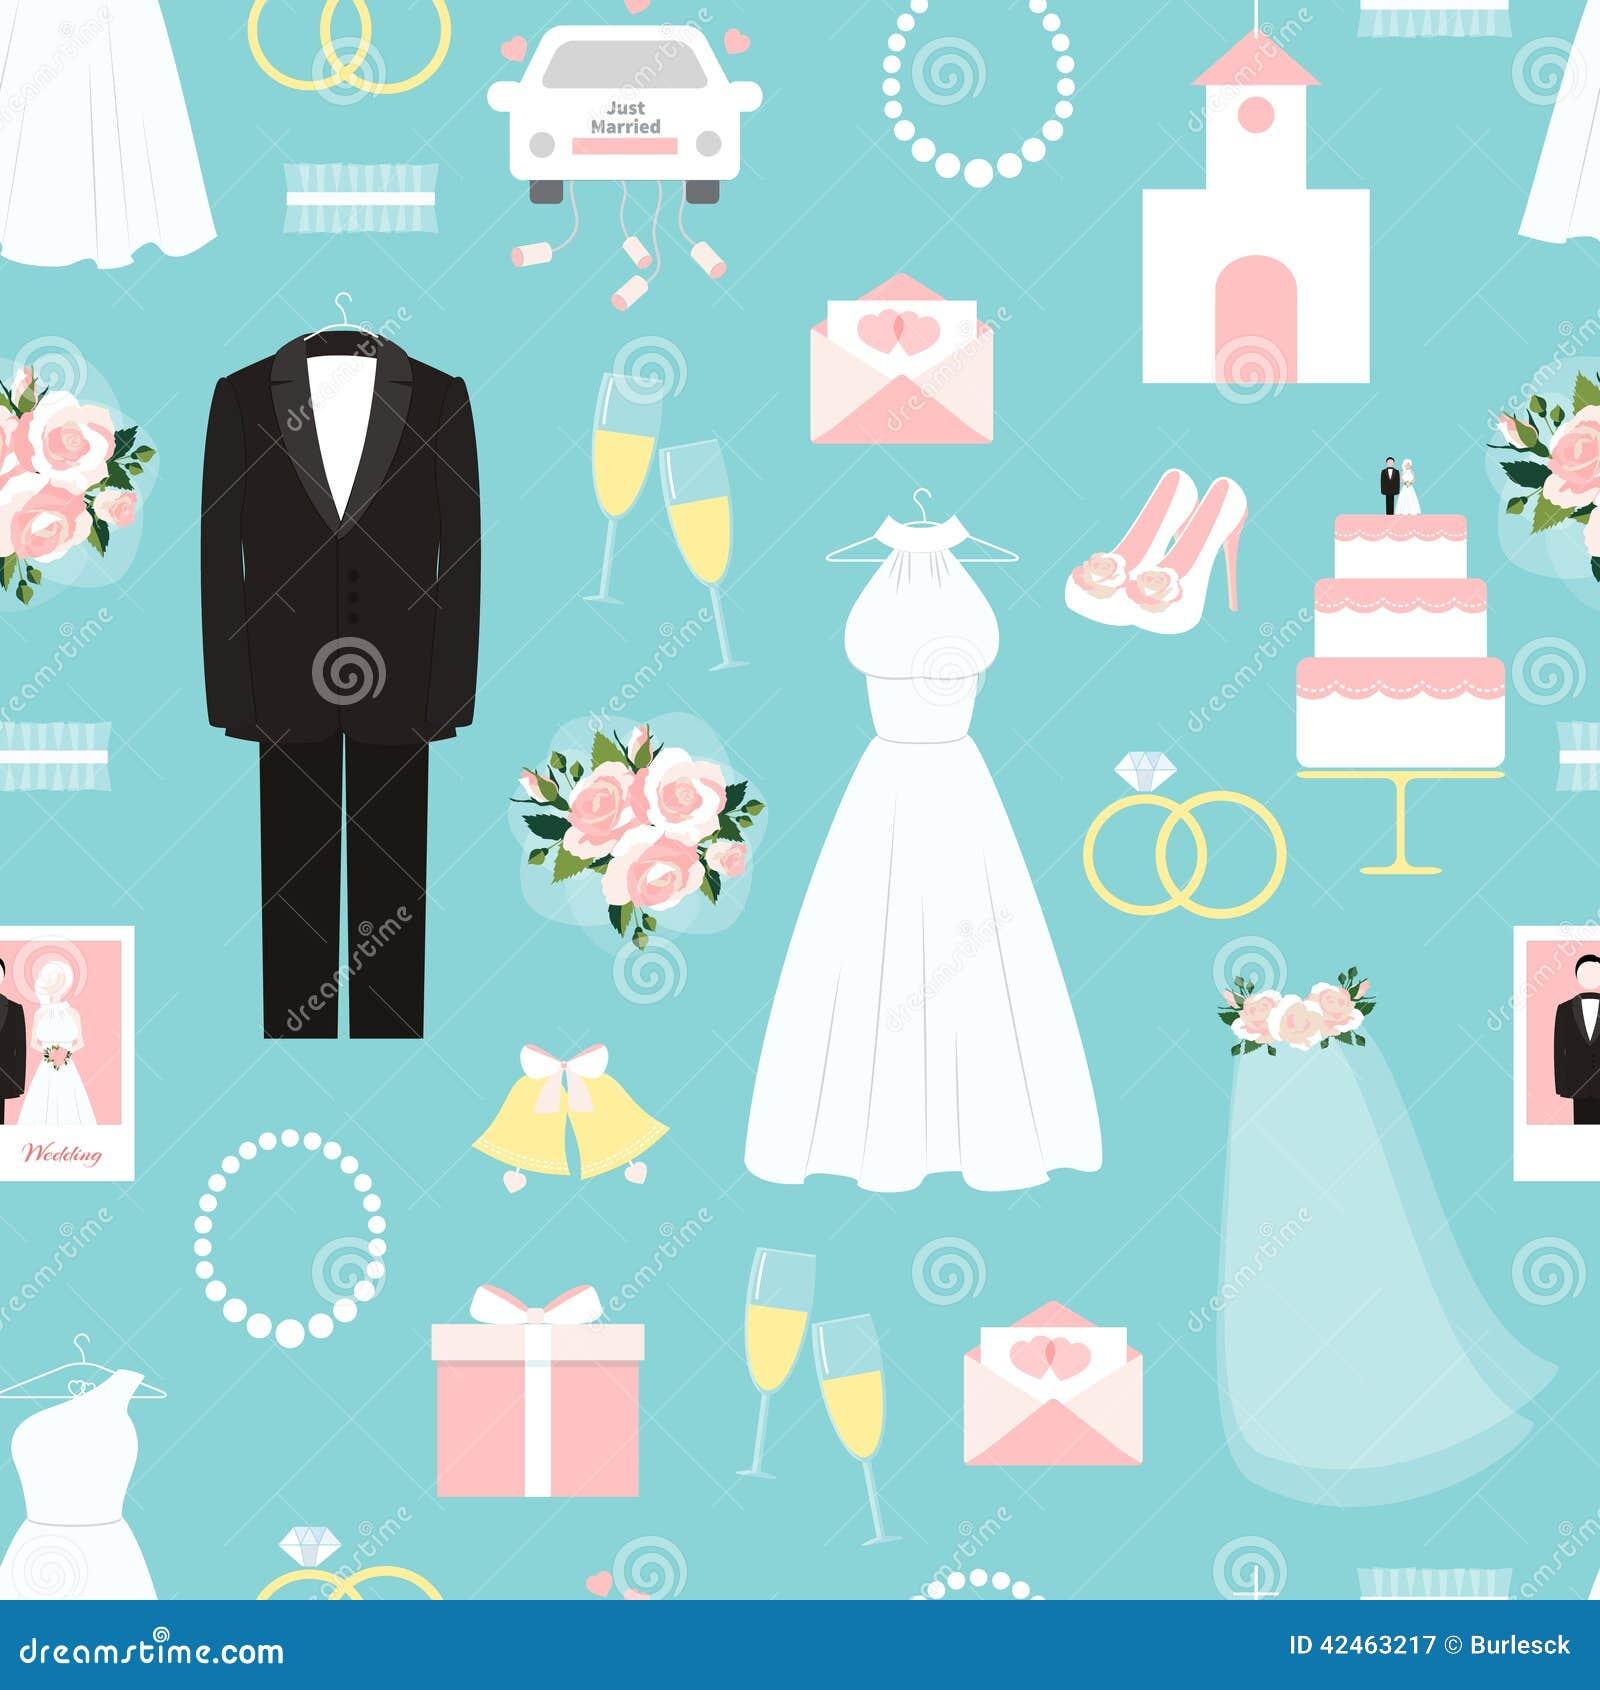 Heiratendes nahtloses Hintergrundmuster